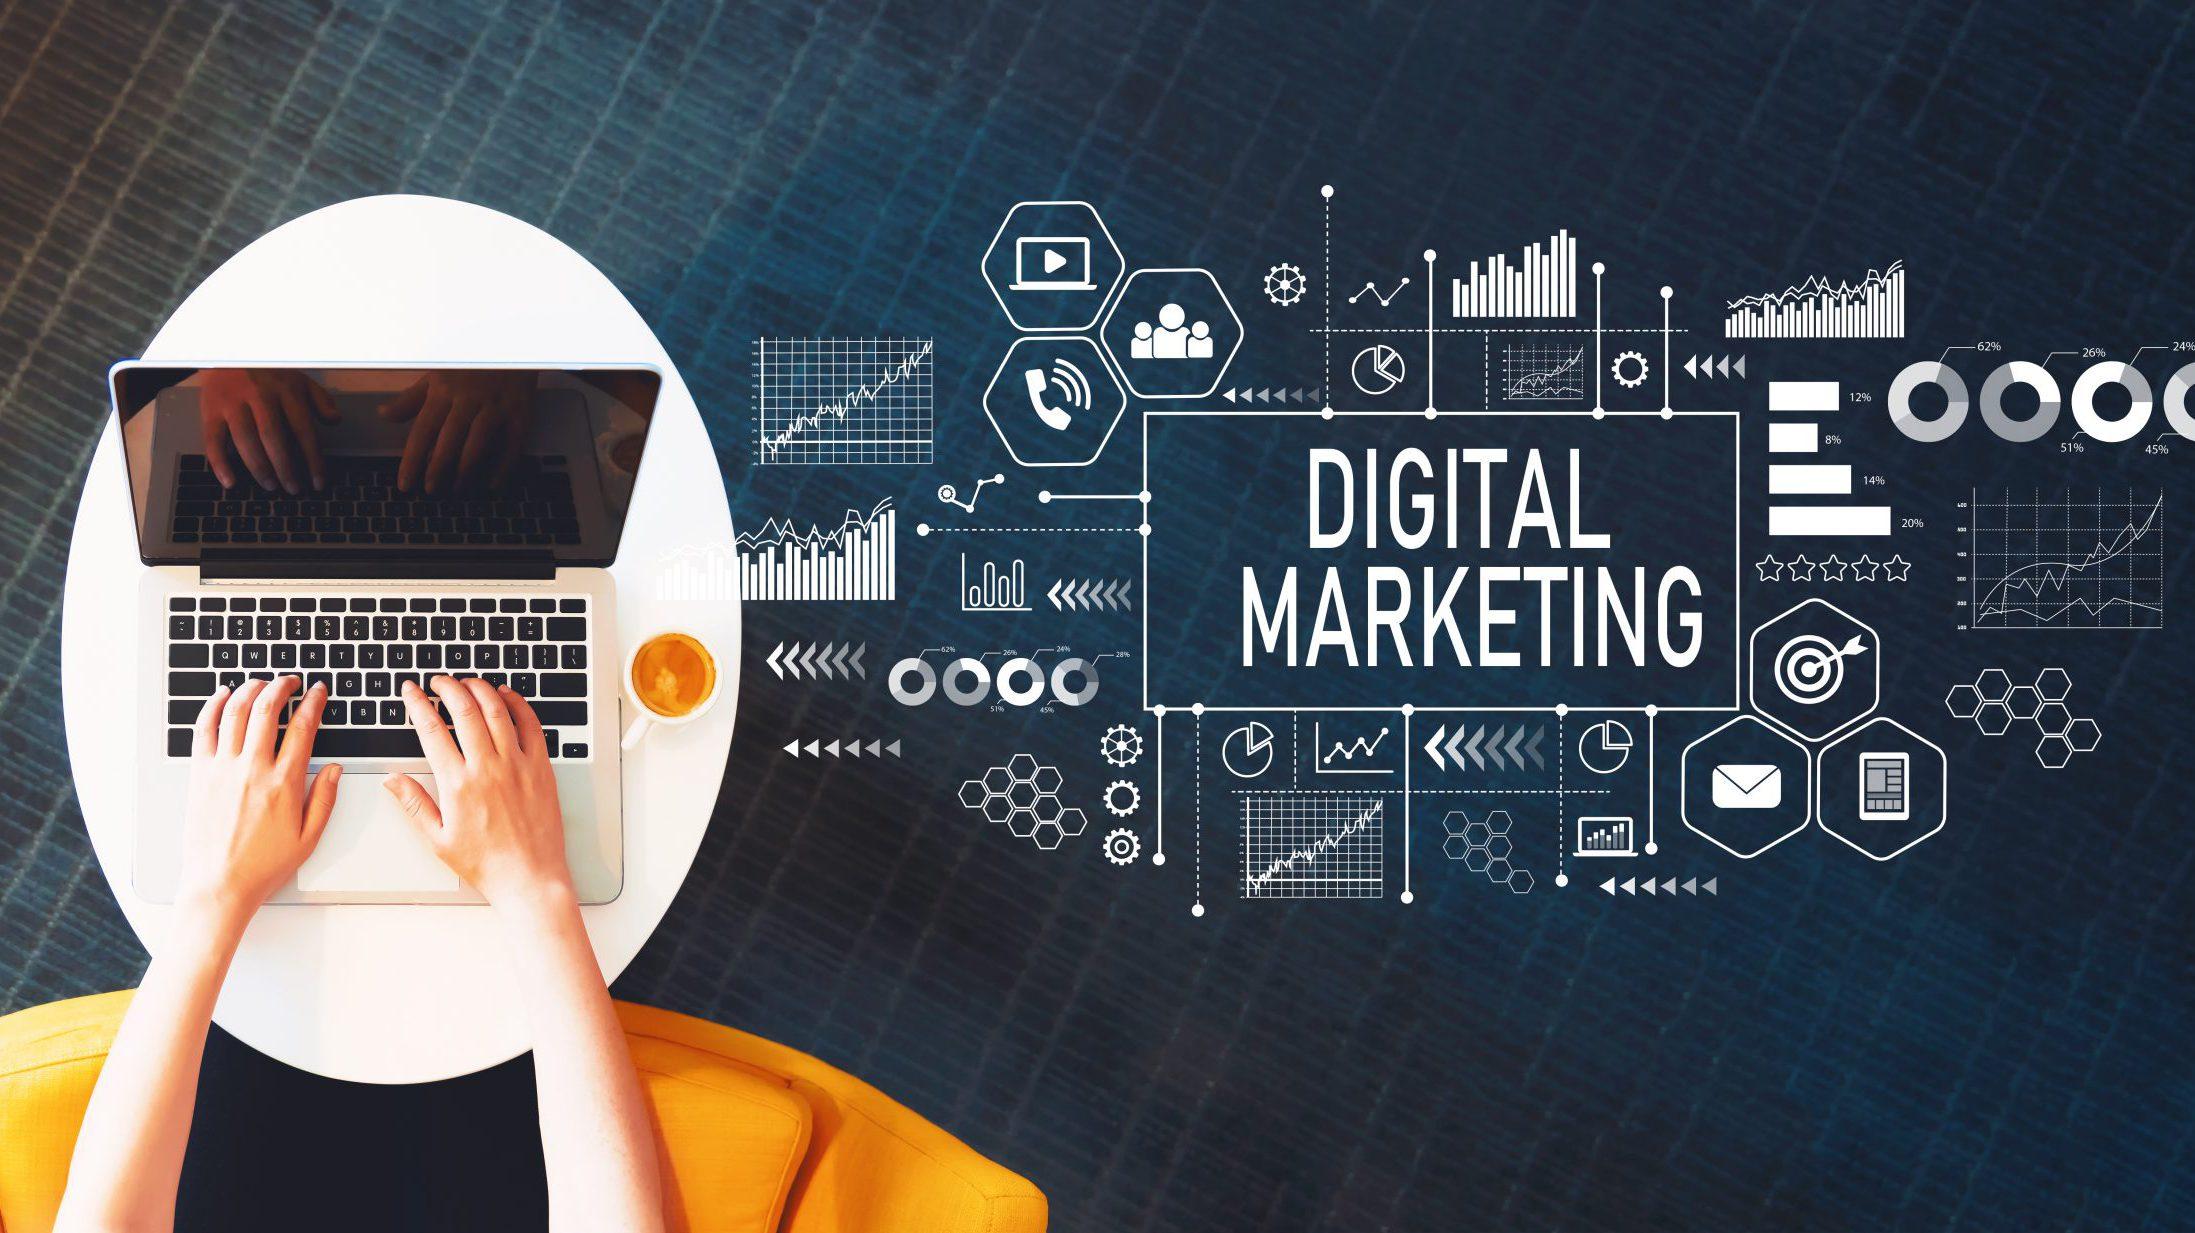 Digital Marketing Growing Demand to Boost the Market Growth | HubSpot,  Inc, Dentsu Aegis Network, SAP SE